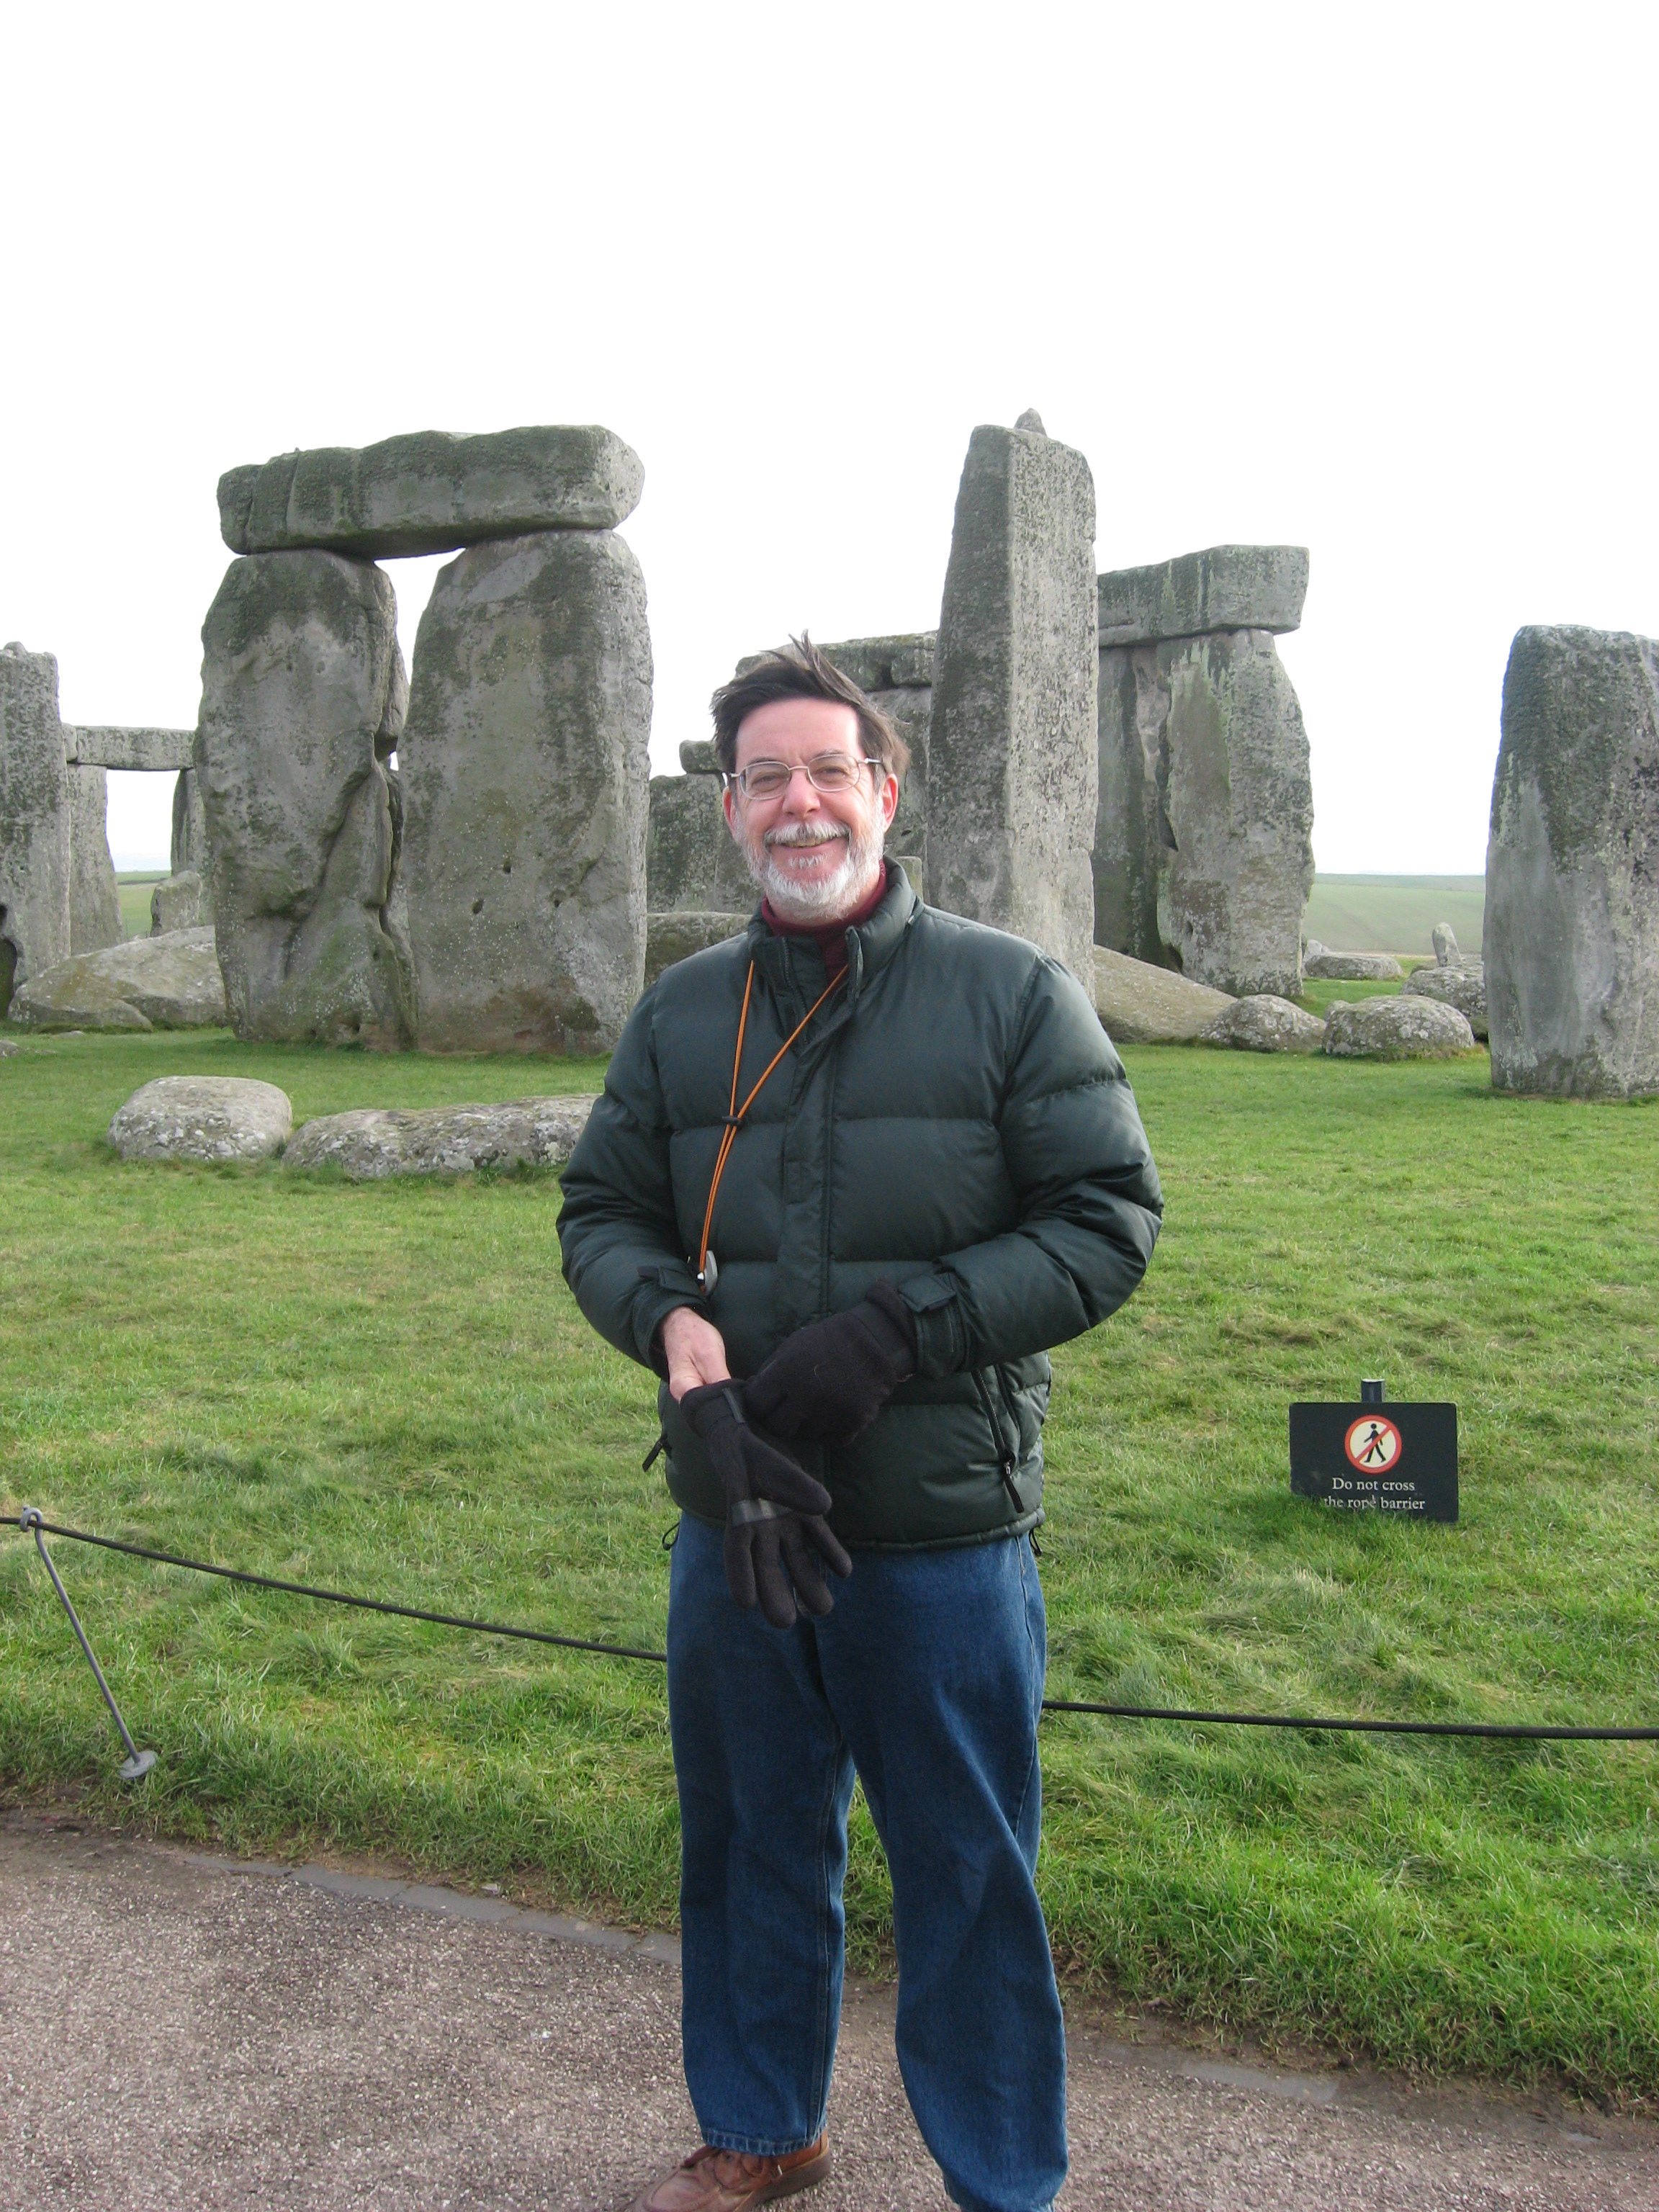 Longfellow stonehenge